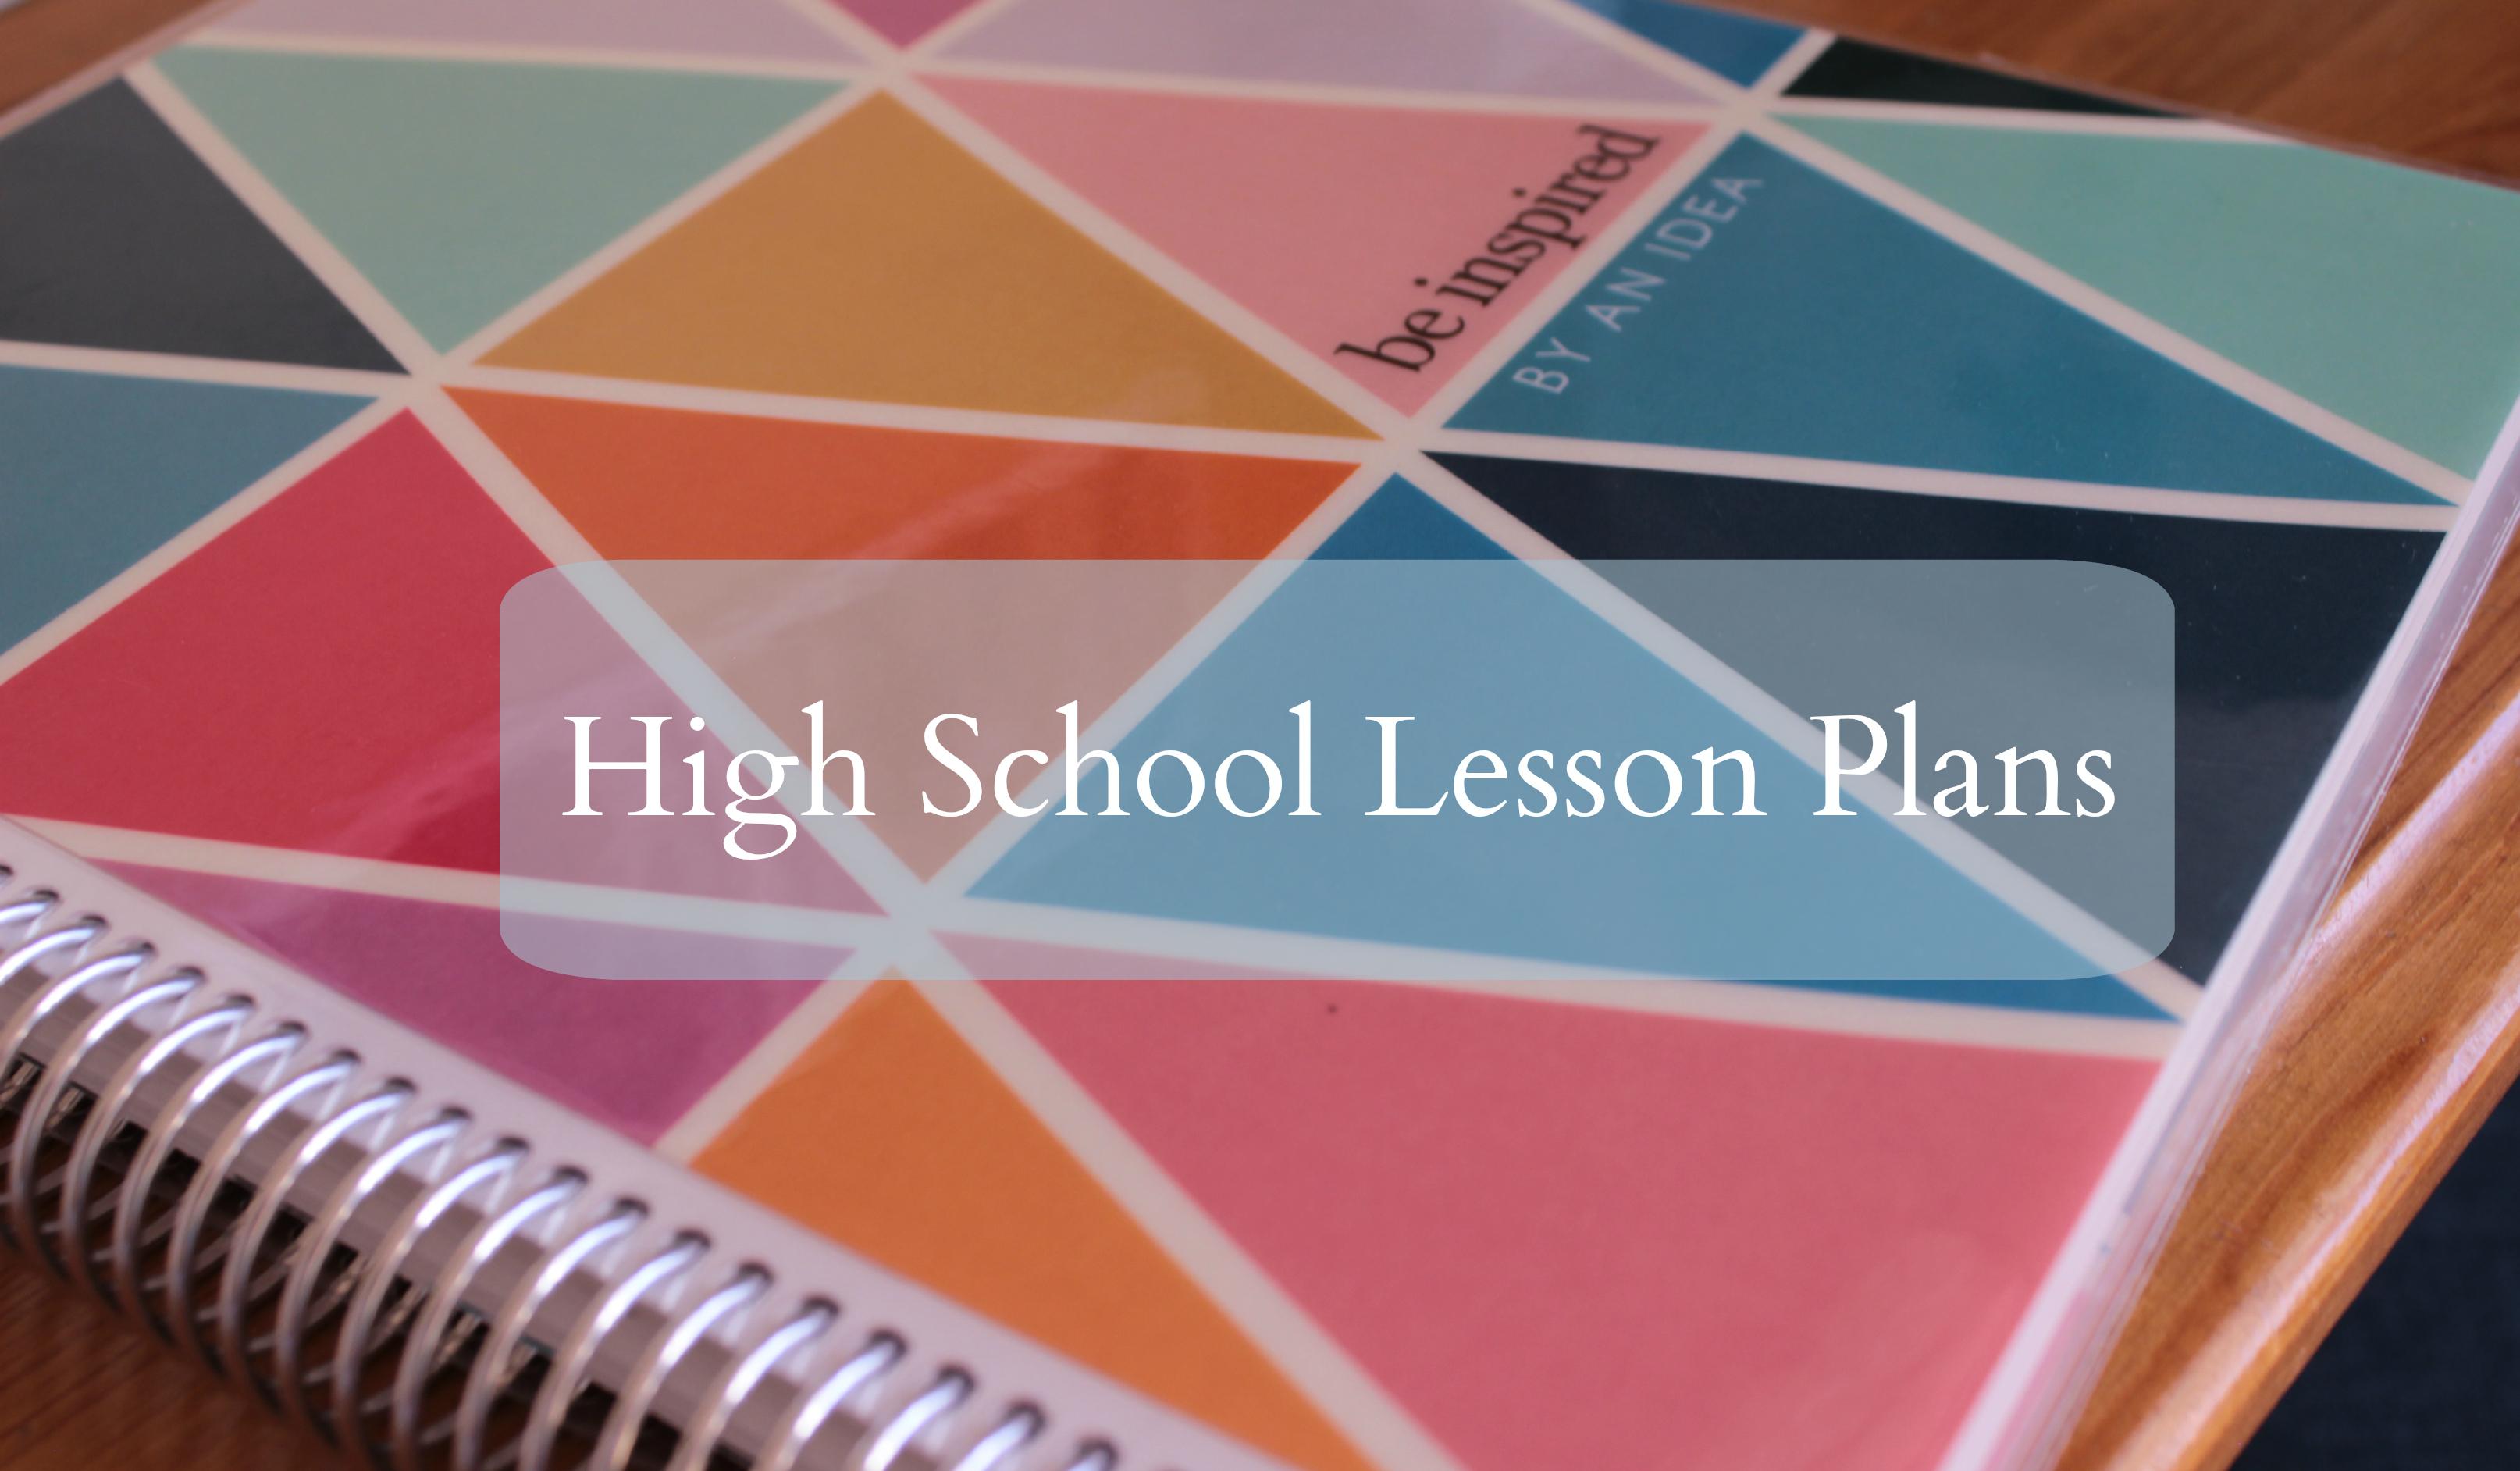 highschoollessonplans